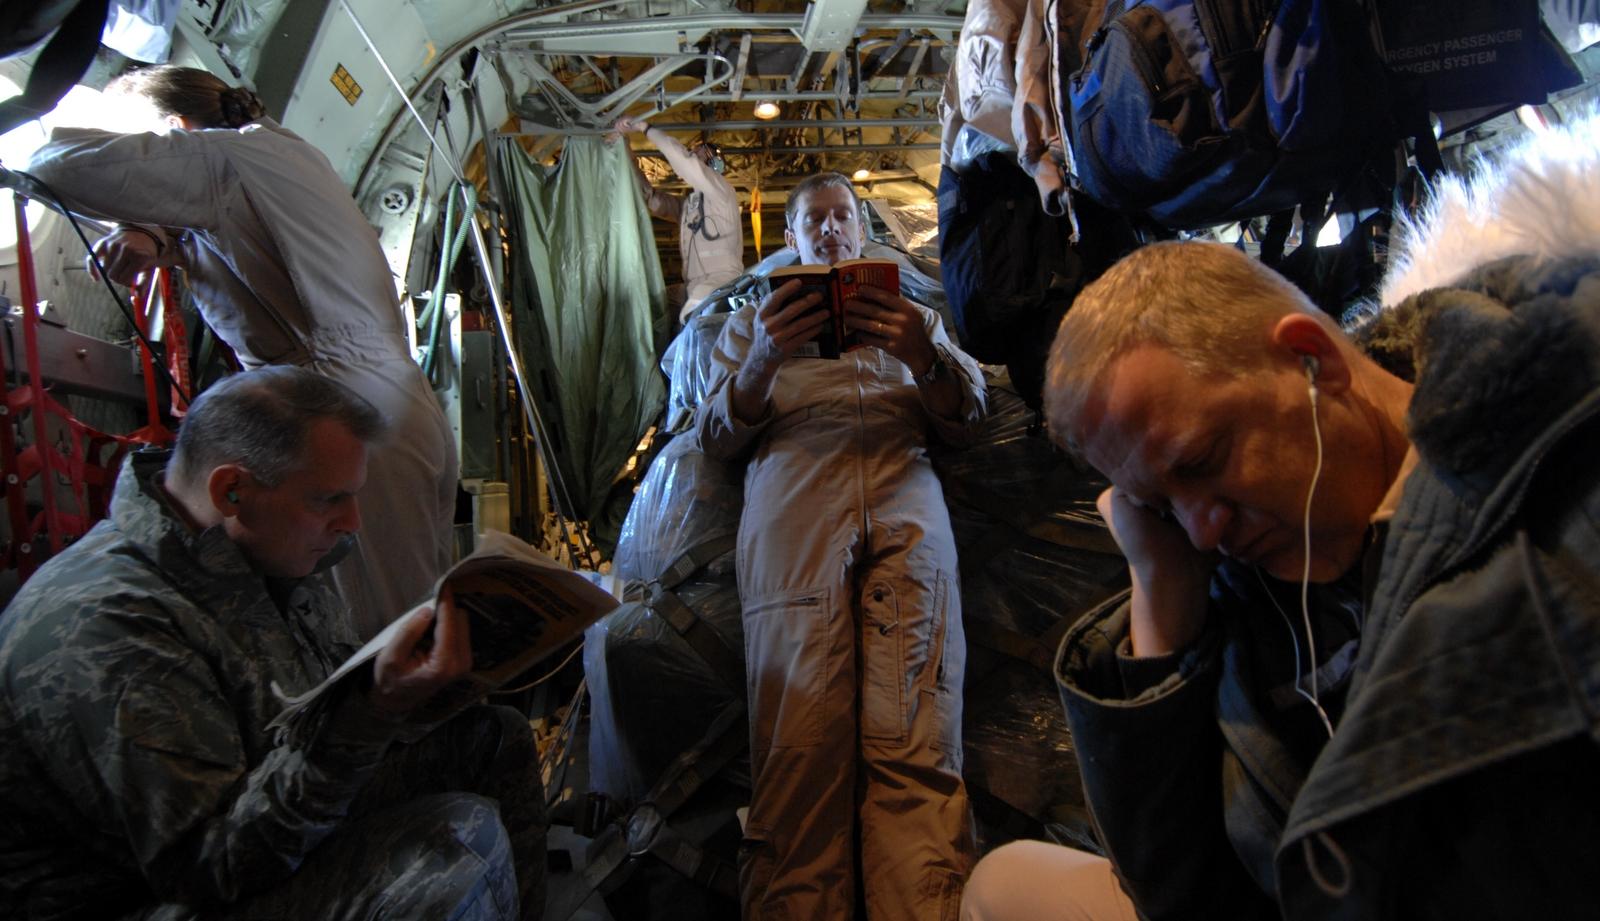 February 2009 – STS-126 Trip